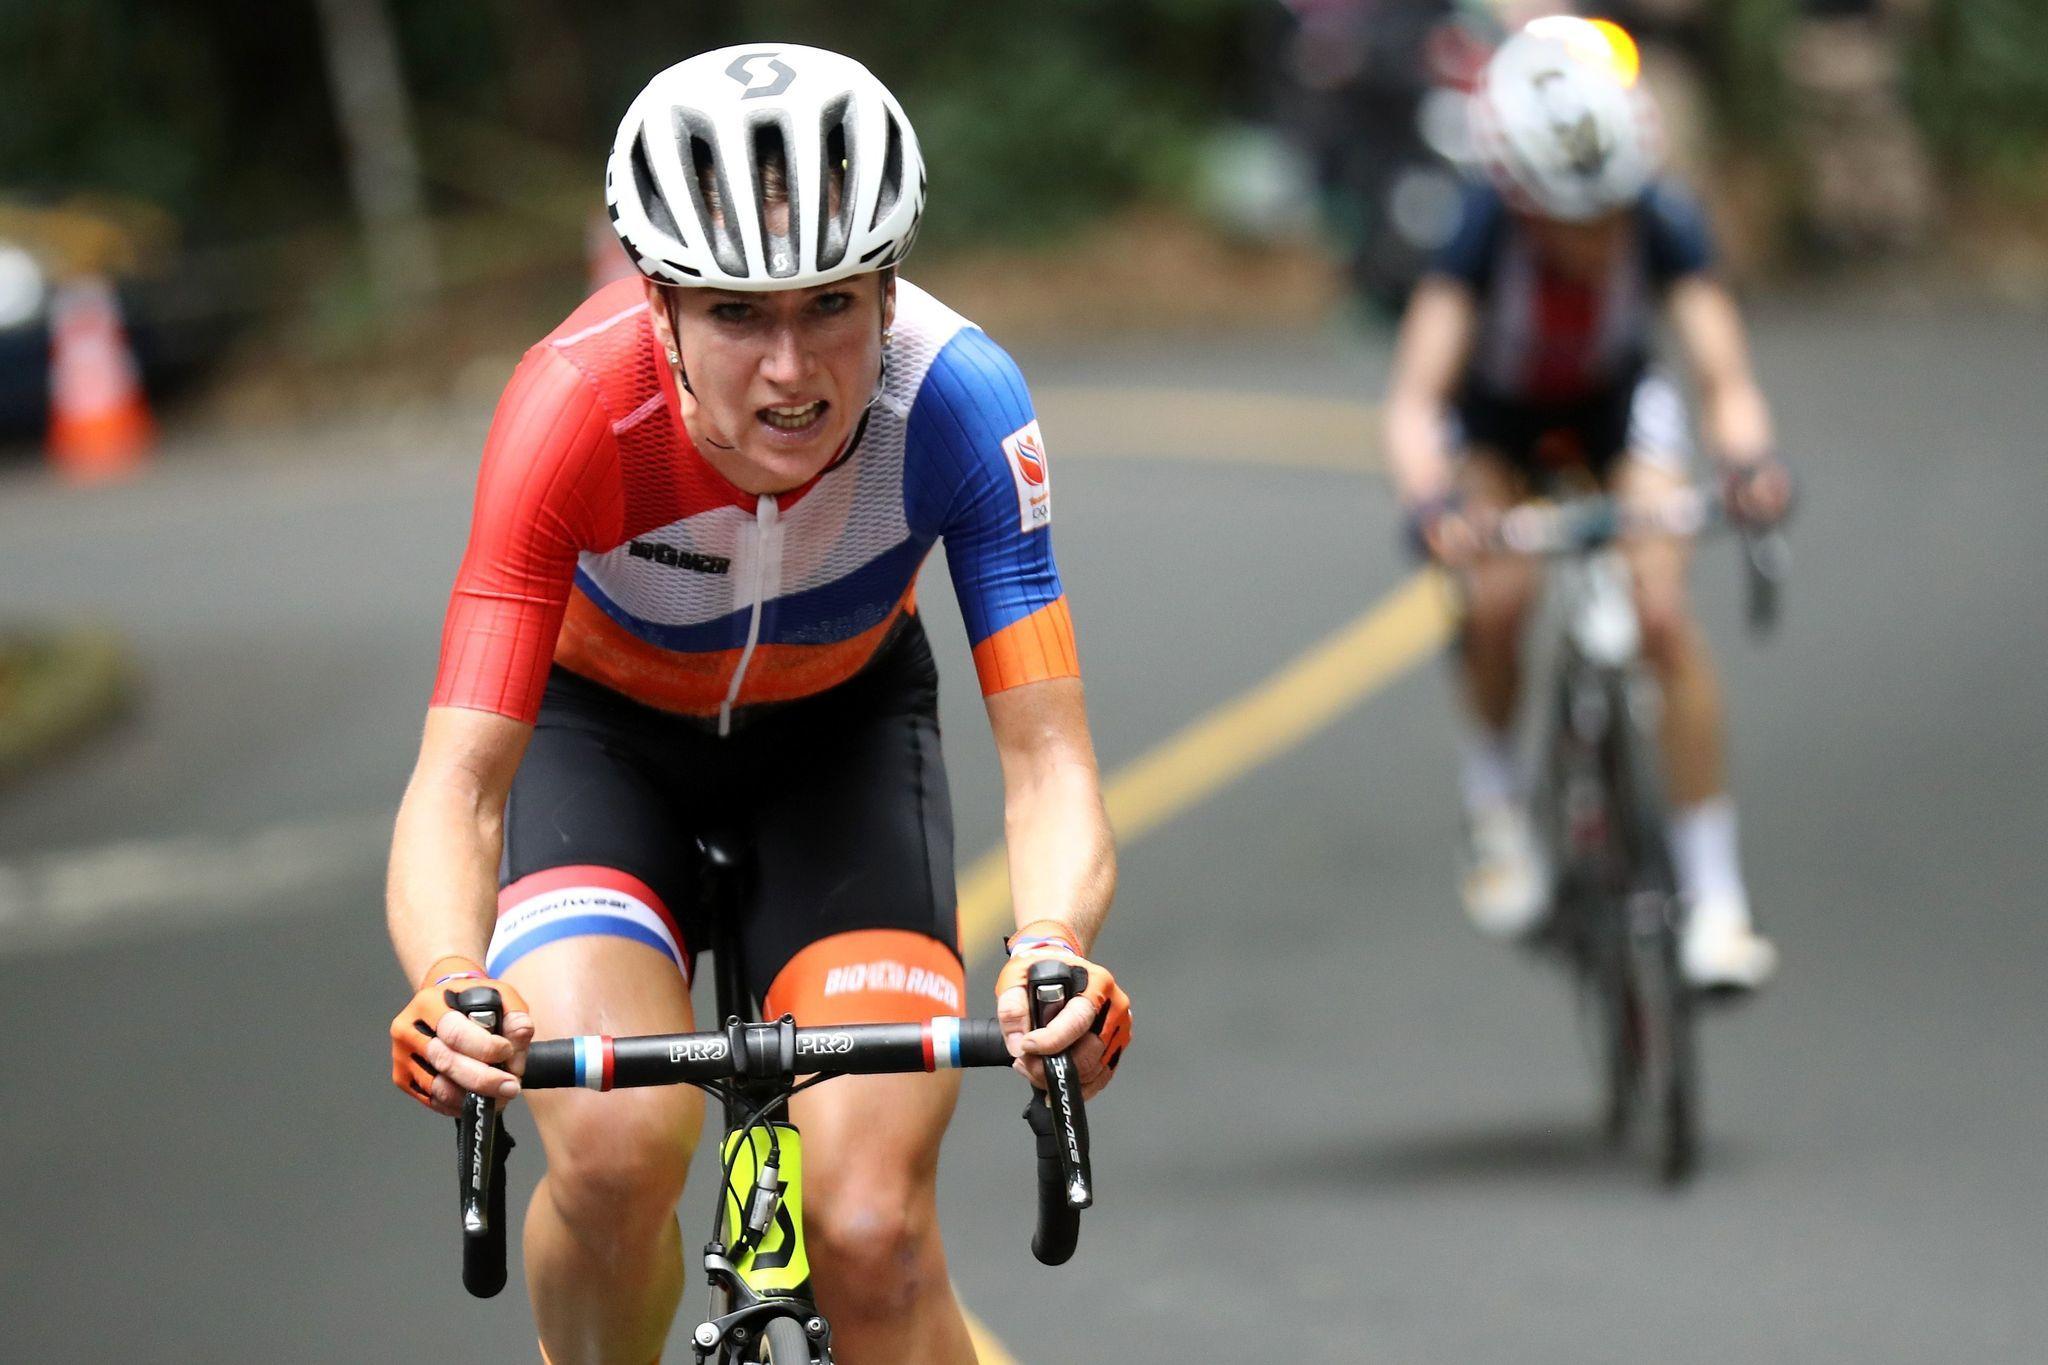 dutch cyclist annemiek van vleuten fractures spine during crash at rh chicagotribune com